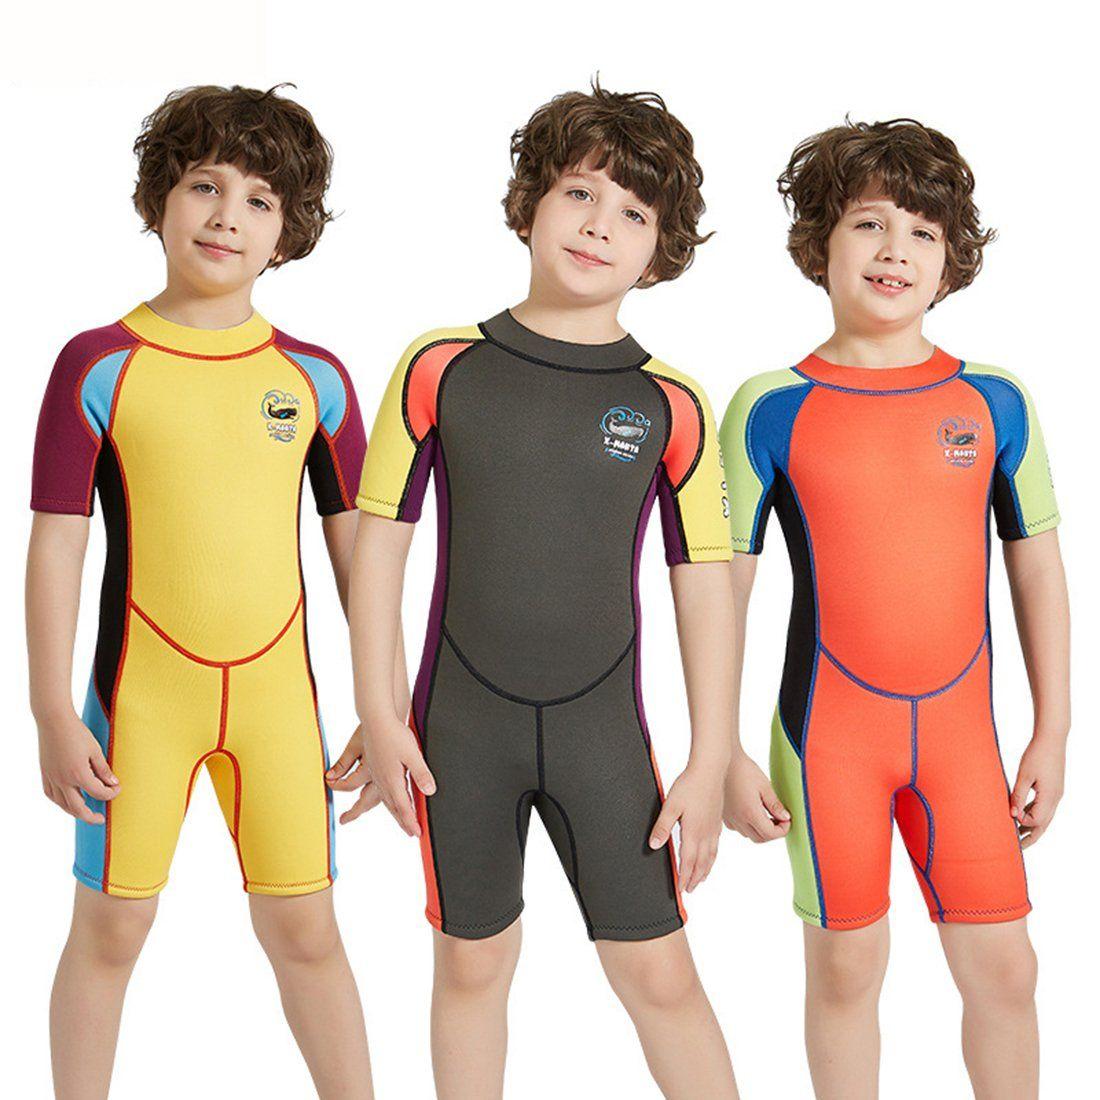 Full Body Kids Wetsuit Neoprene One Piece Warm Swimsuit 2.5MM for Girls Boys Children Long Sleeve UV Protection Swimming Suit Back Zip for Surfing Scuba Snorkeling Diving Fishing